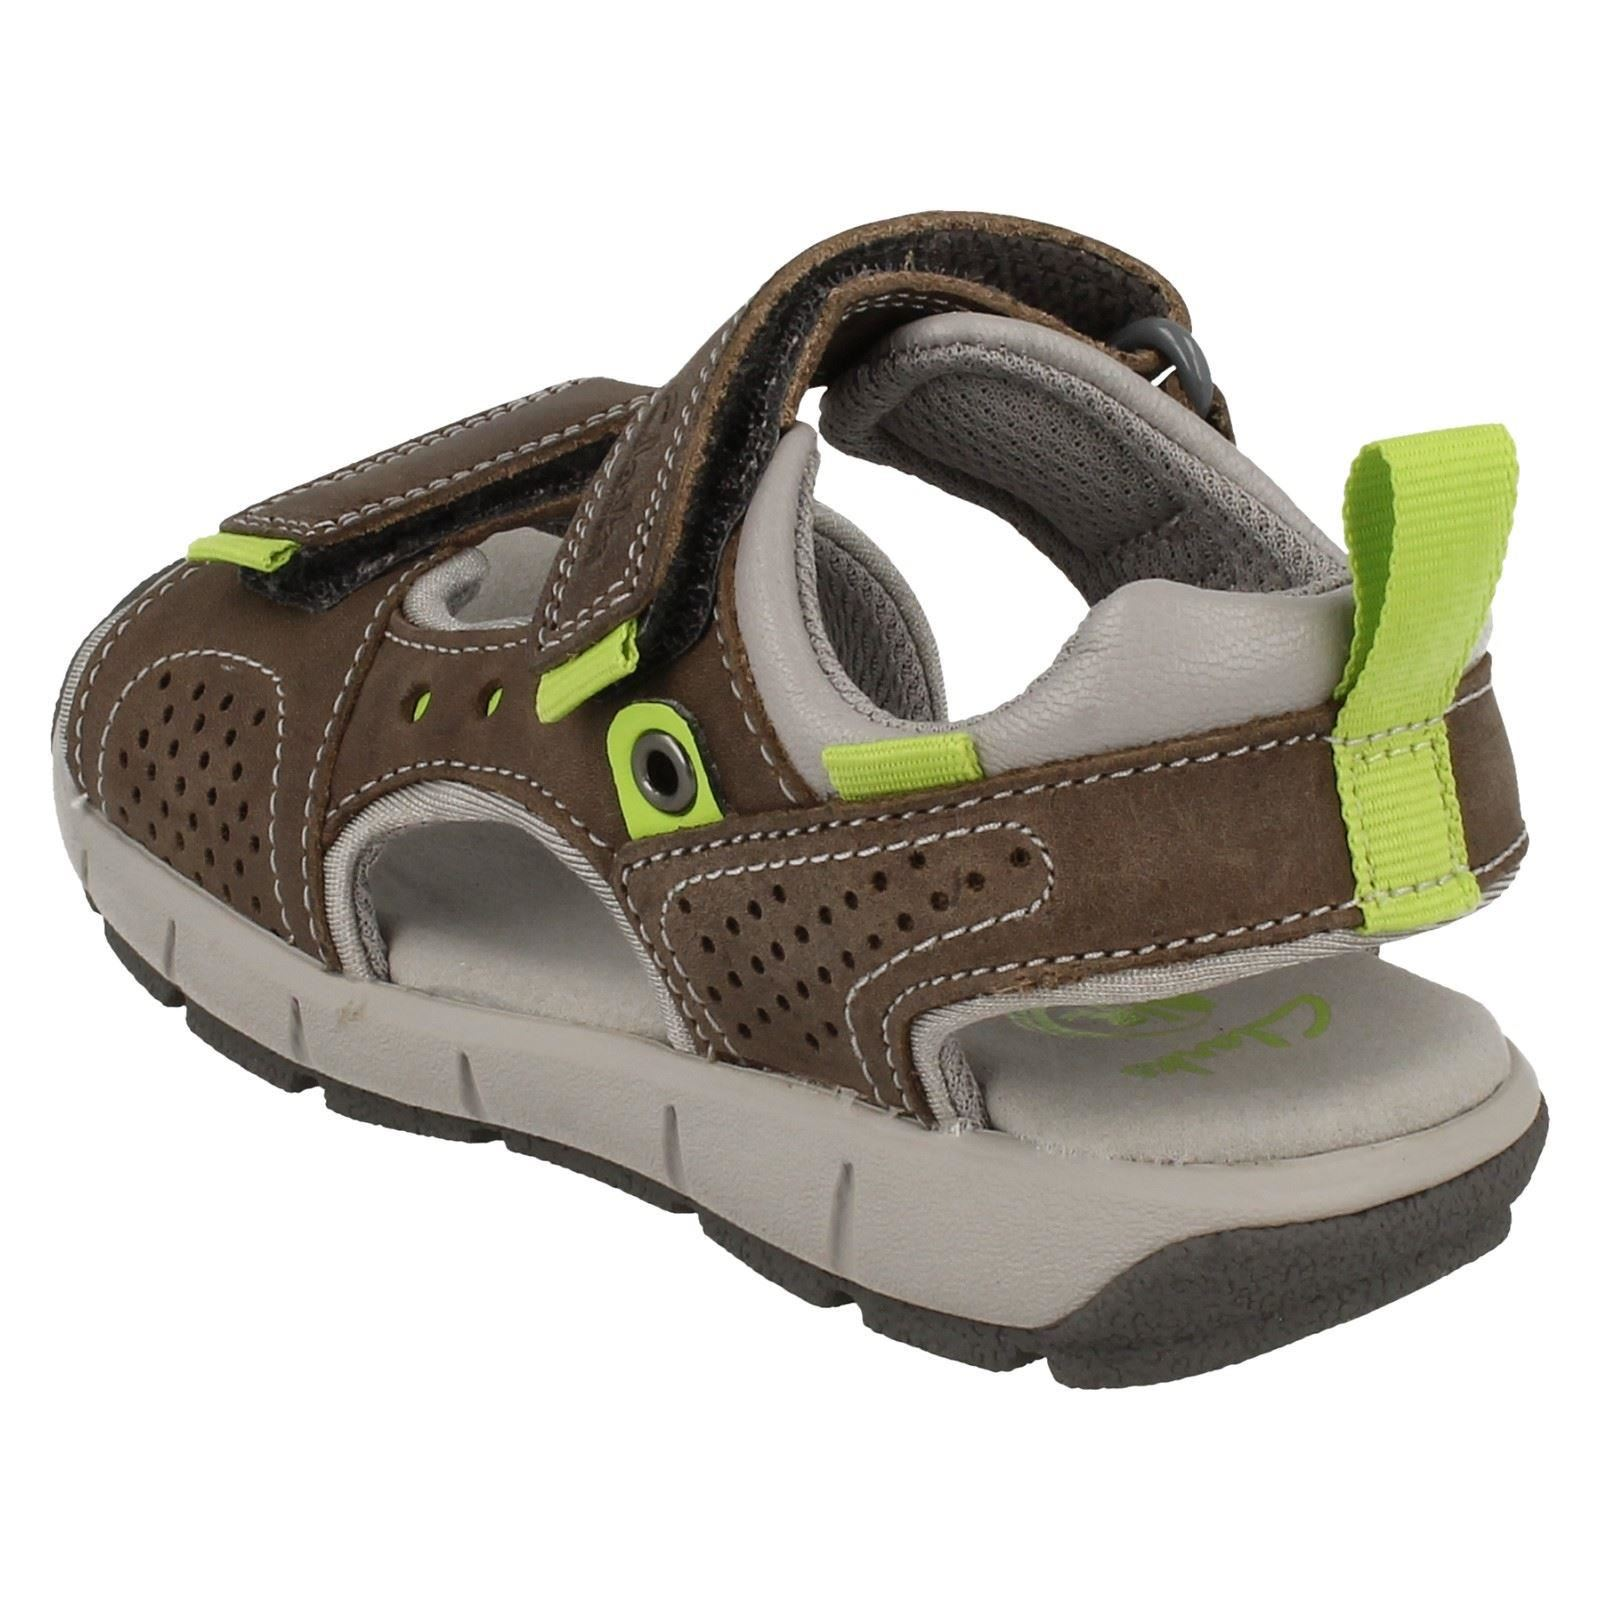 7867e579e60 Infant/Junior Boys Clarks Casual Summer Sandals Jolly Wild | eBay